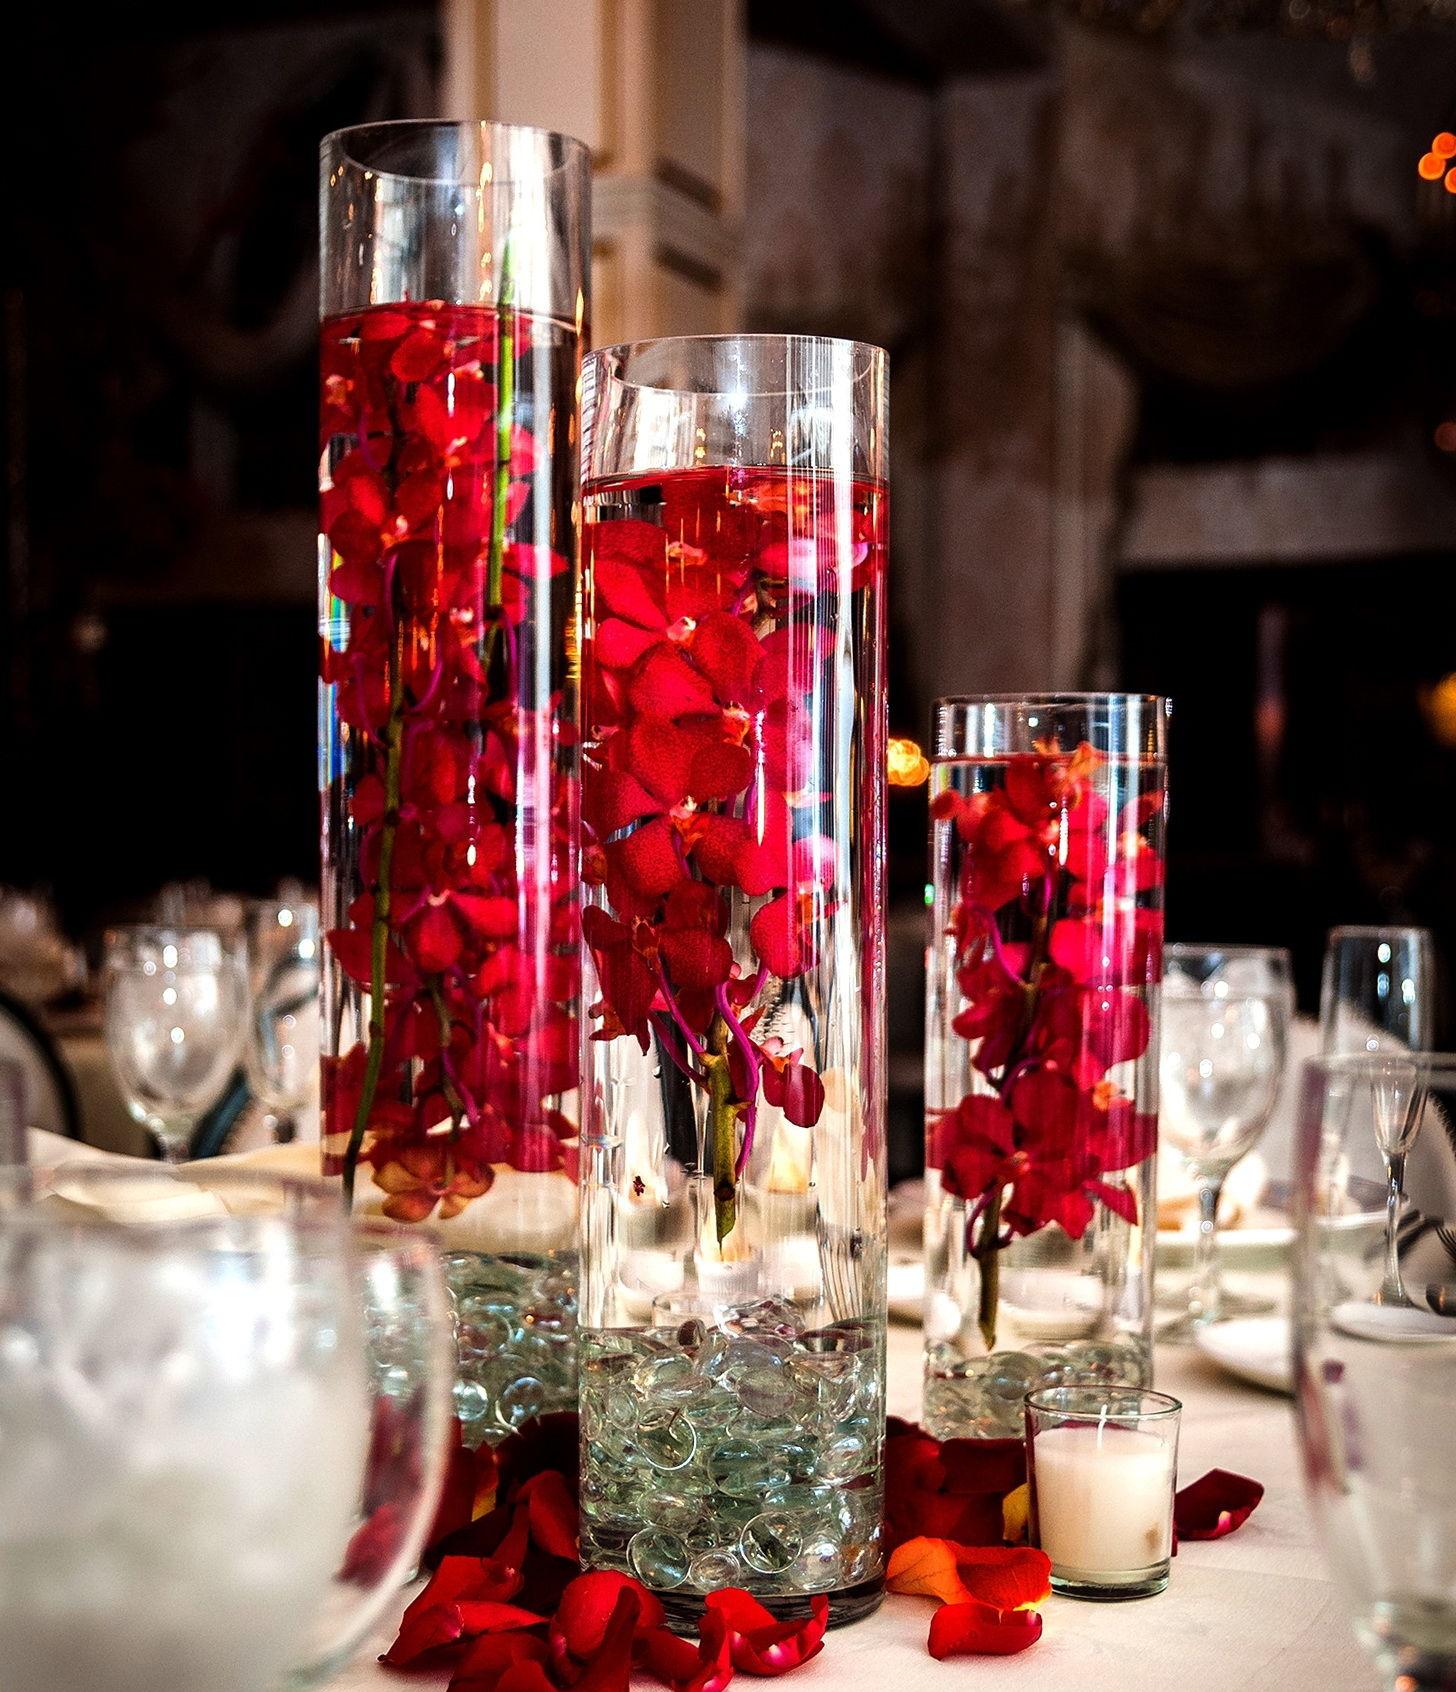 Gorgeous glass vase christmas centerpiece pictures photos